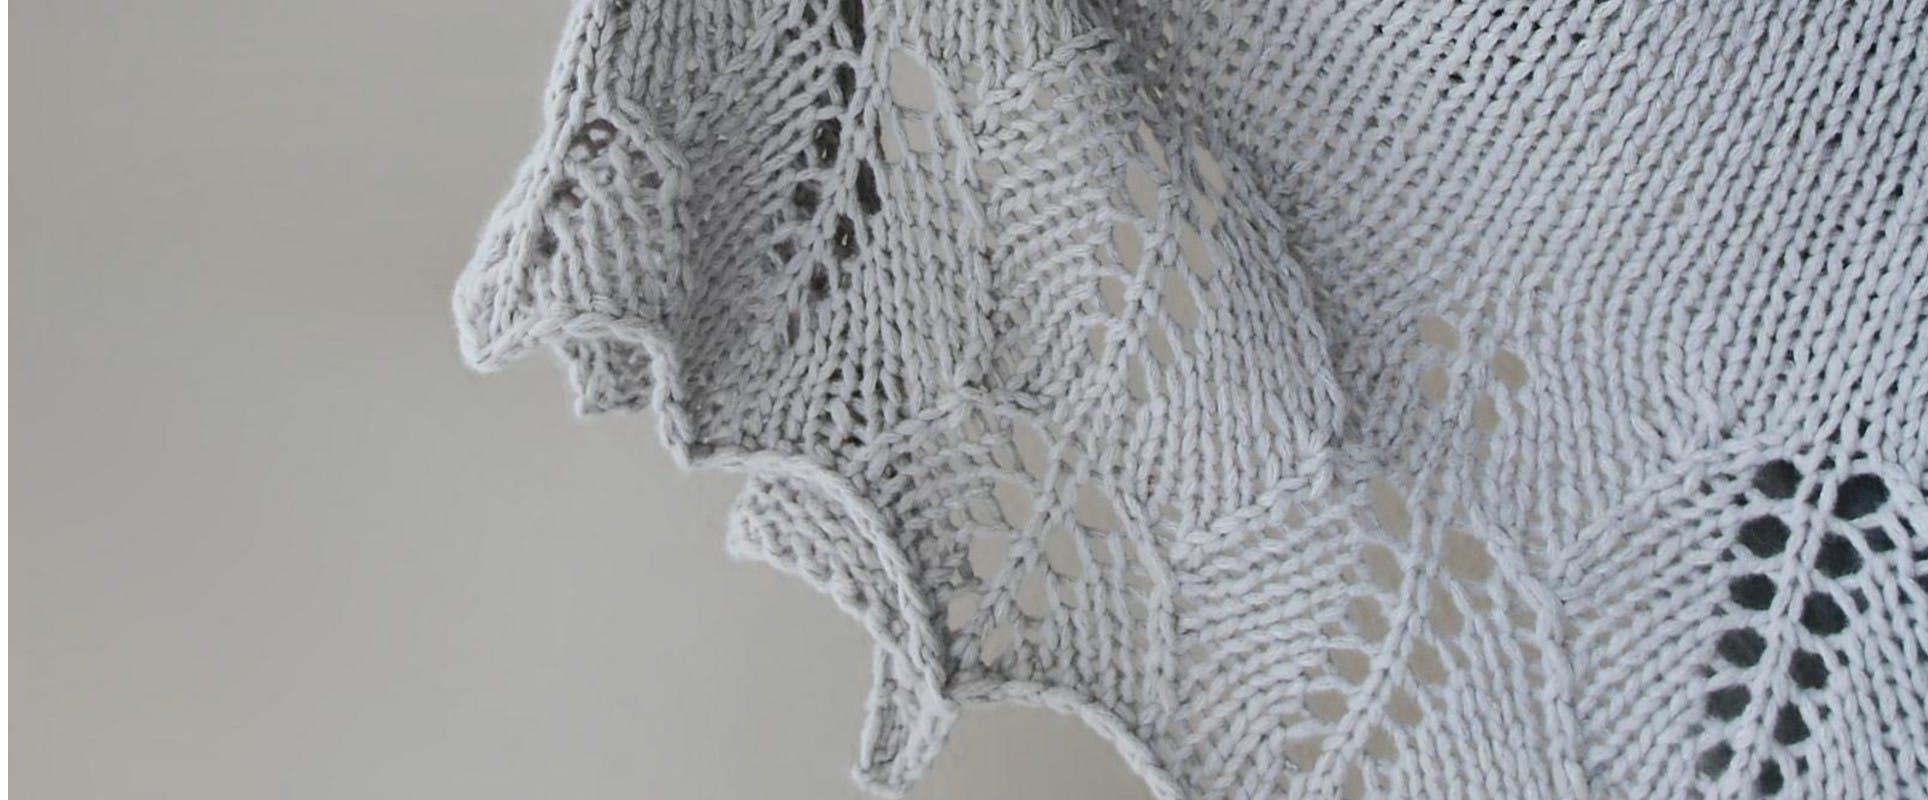 2aea0d1a4db0269525bb8ae92556b114c6685a2f lace shawl 1